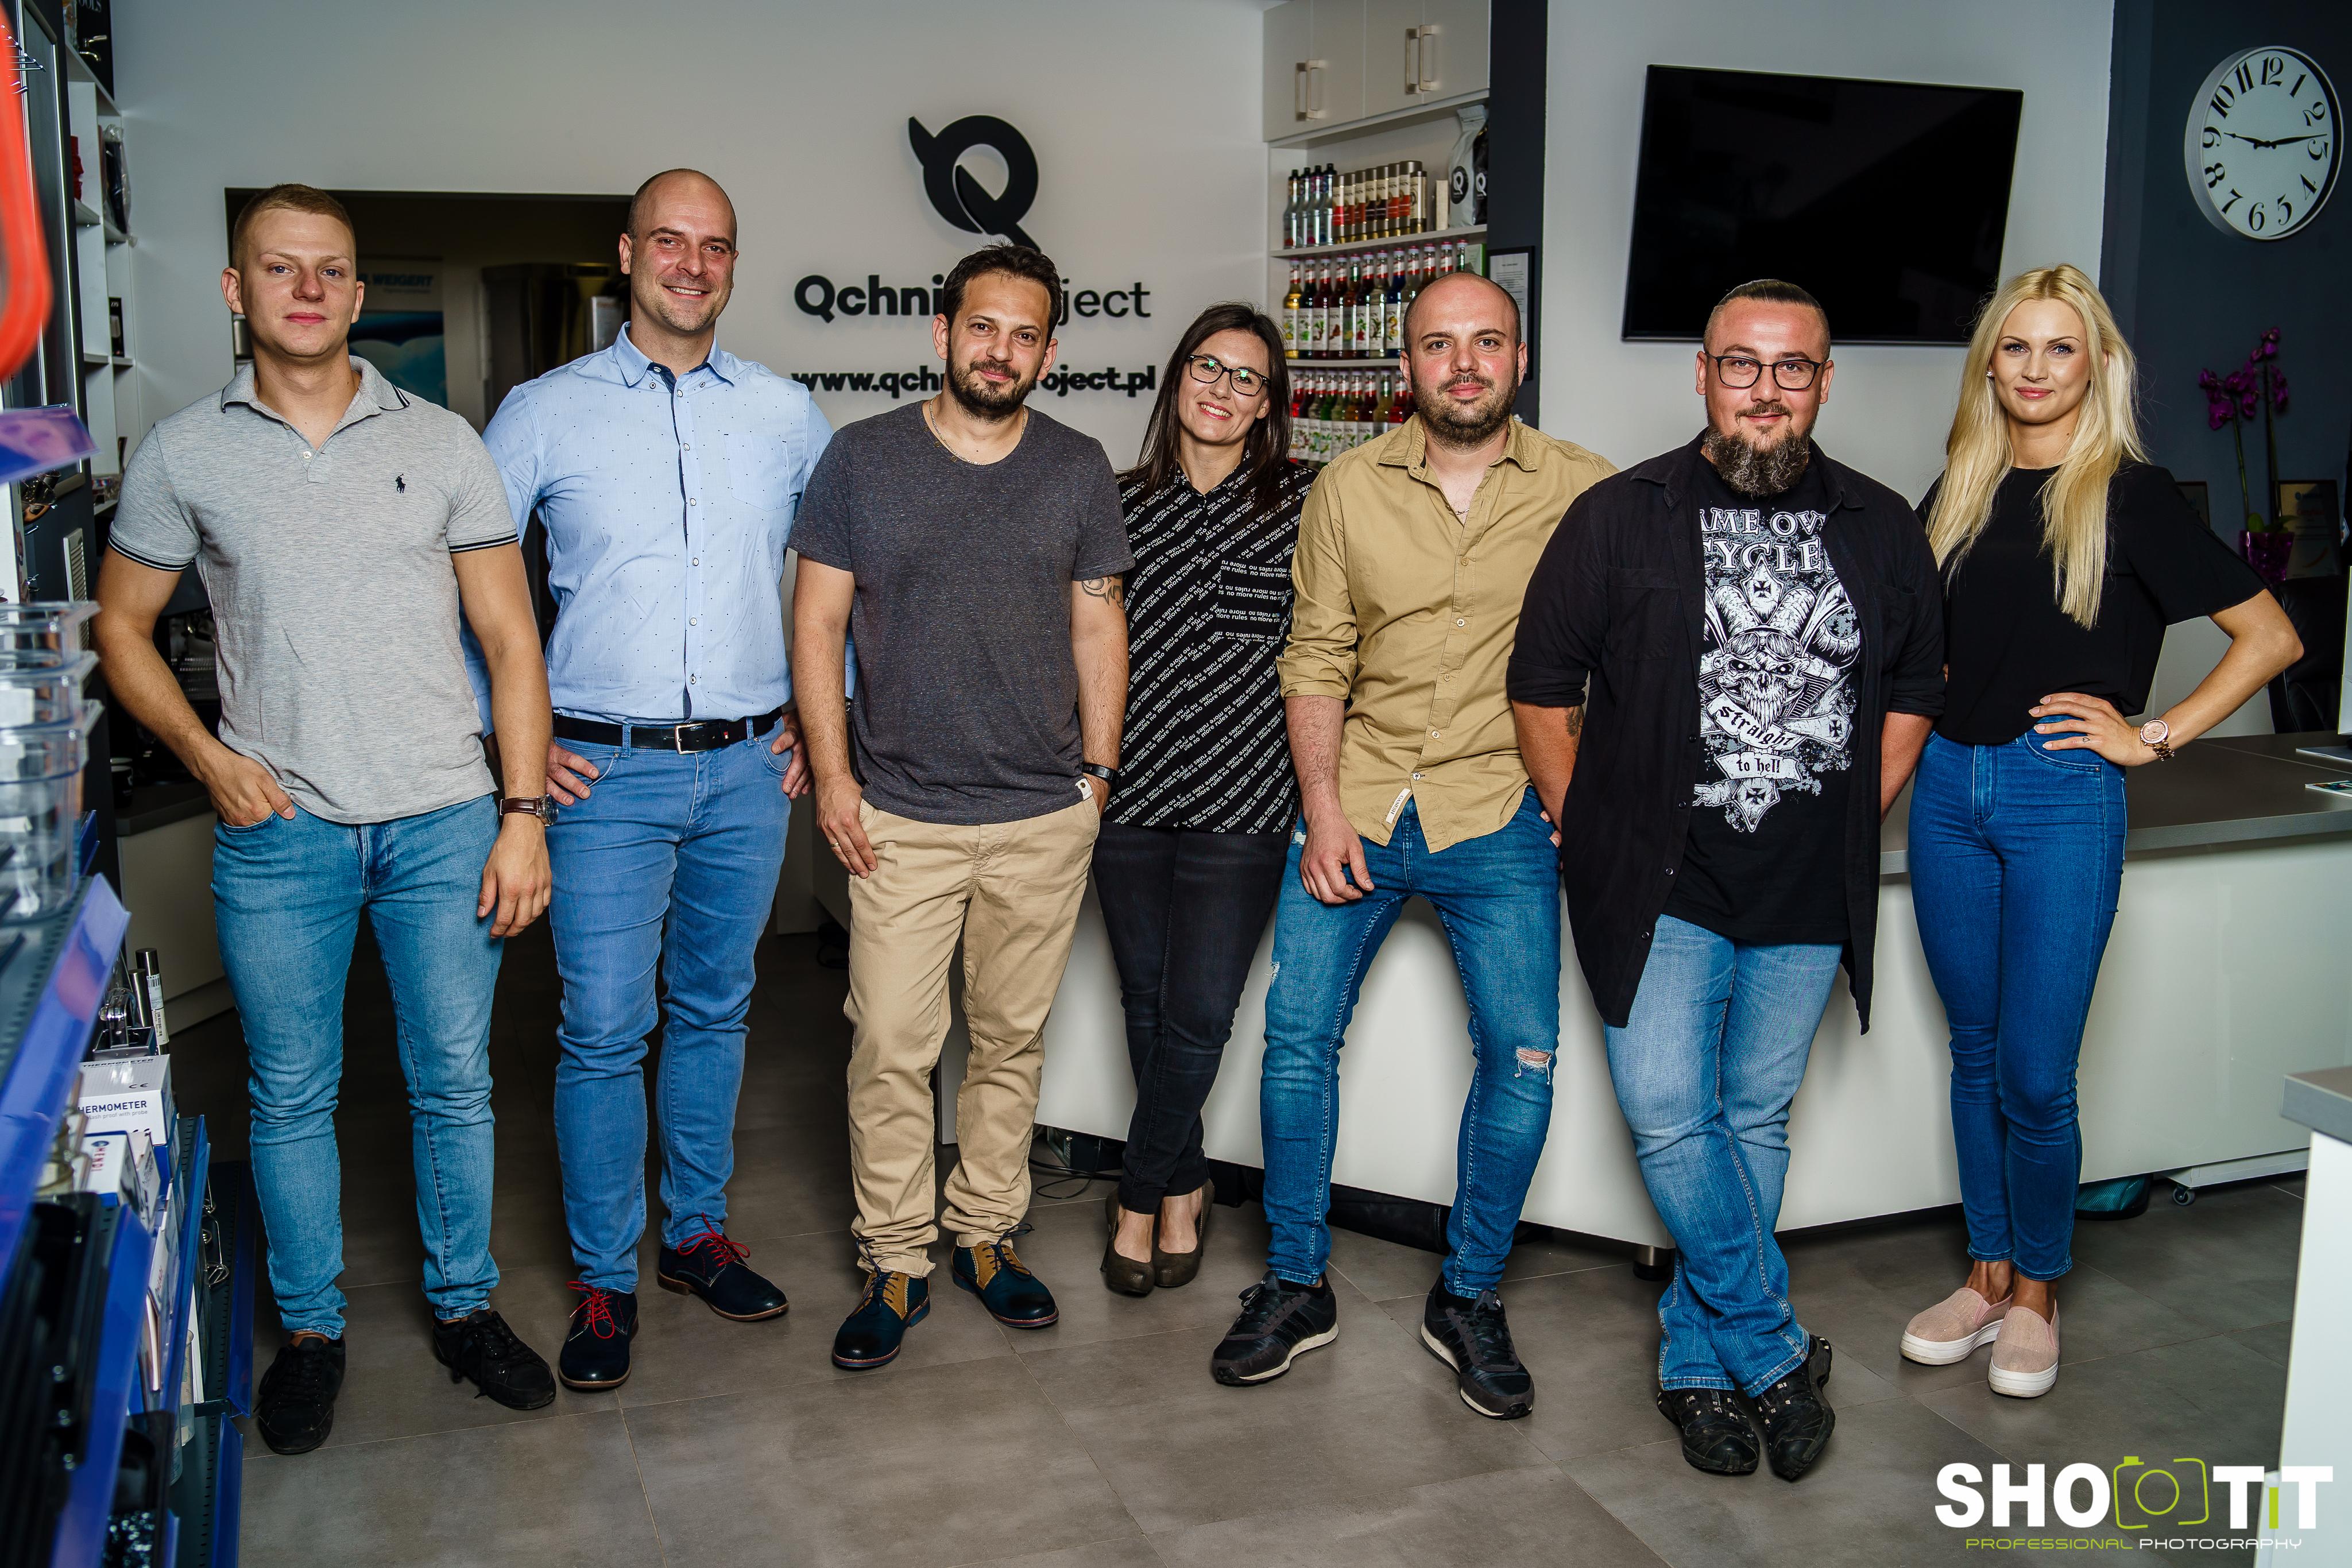 Qchnia Project